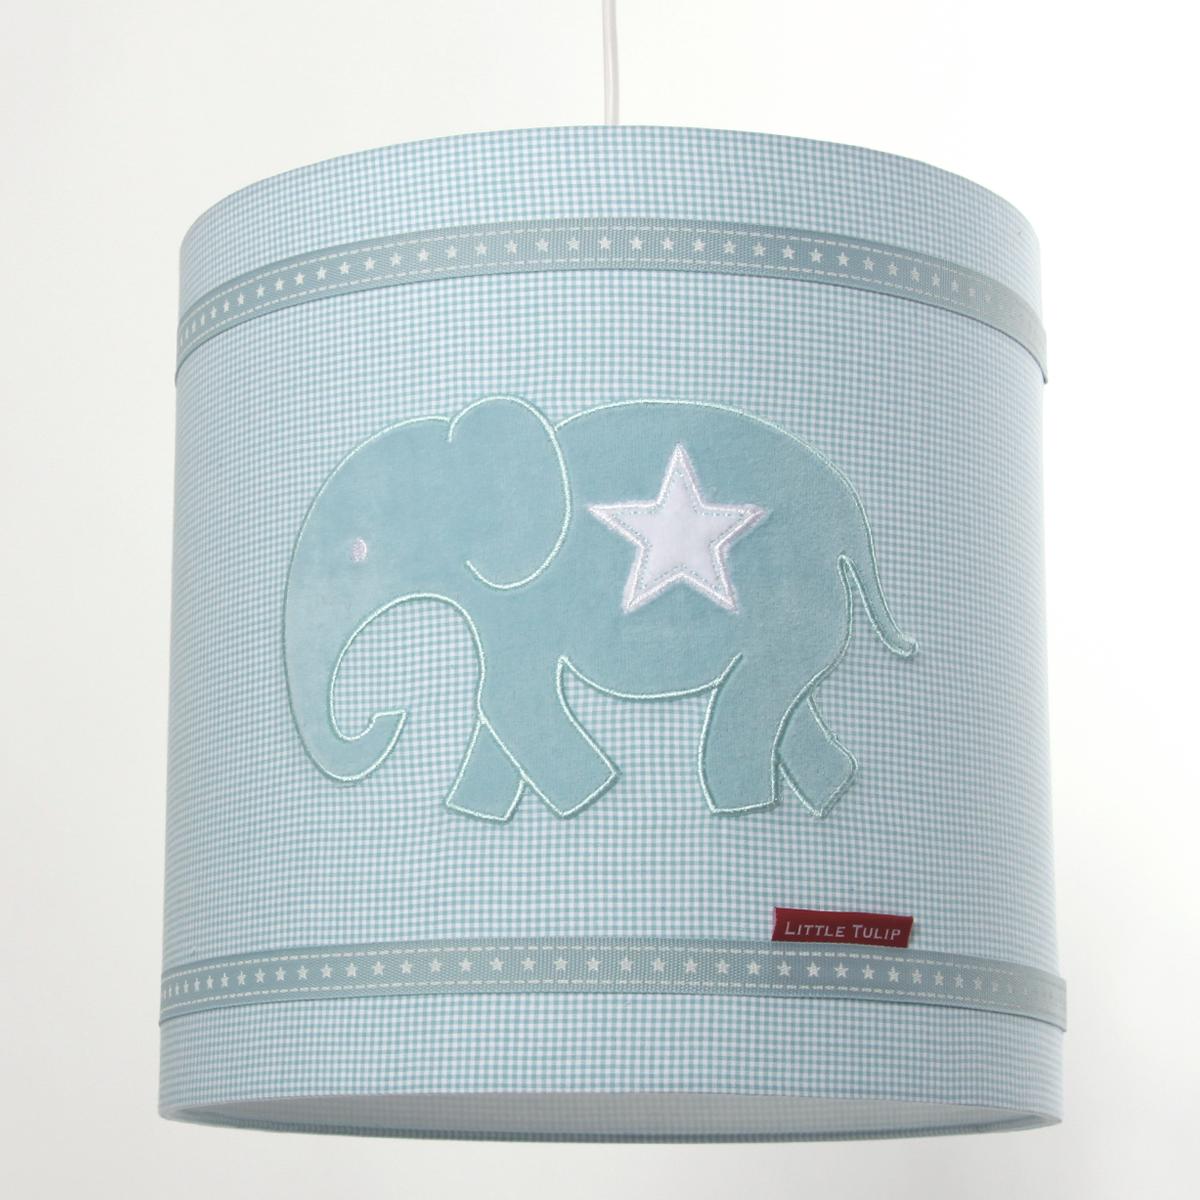 Little tulip Hanglamp olifant aqua blauw ster eco lief kinderkamer babykamer babyuitzet unisex jongen meisje steigerhout